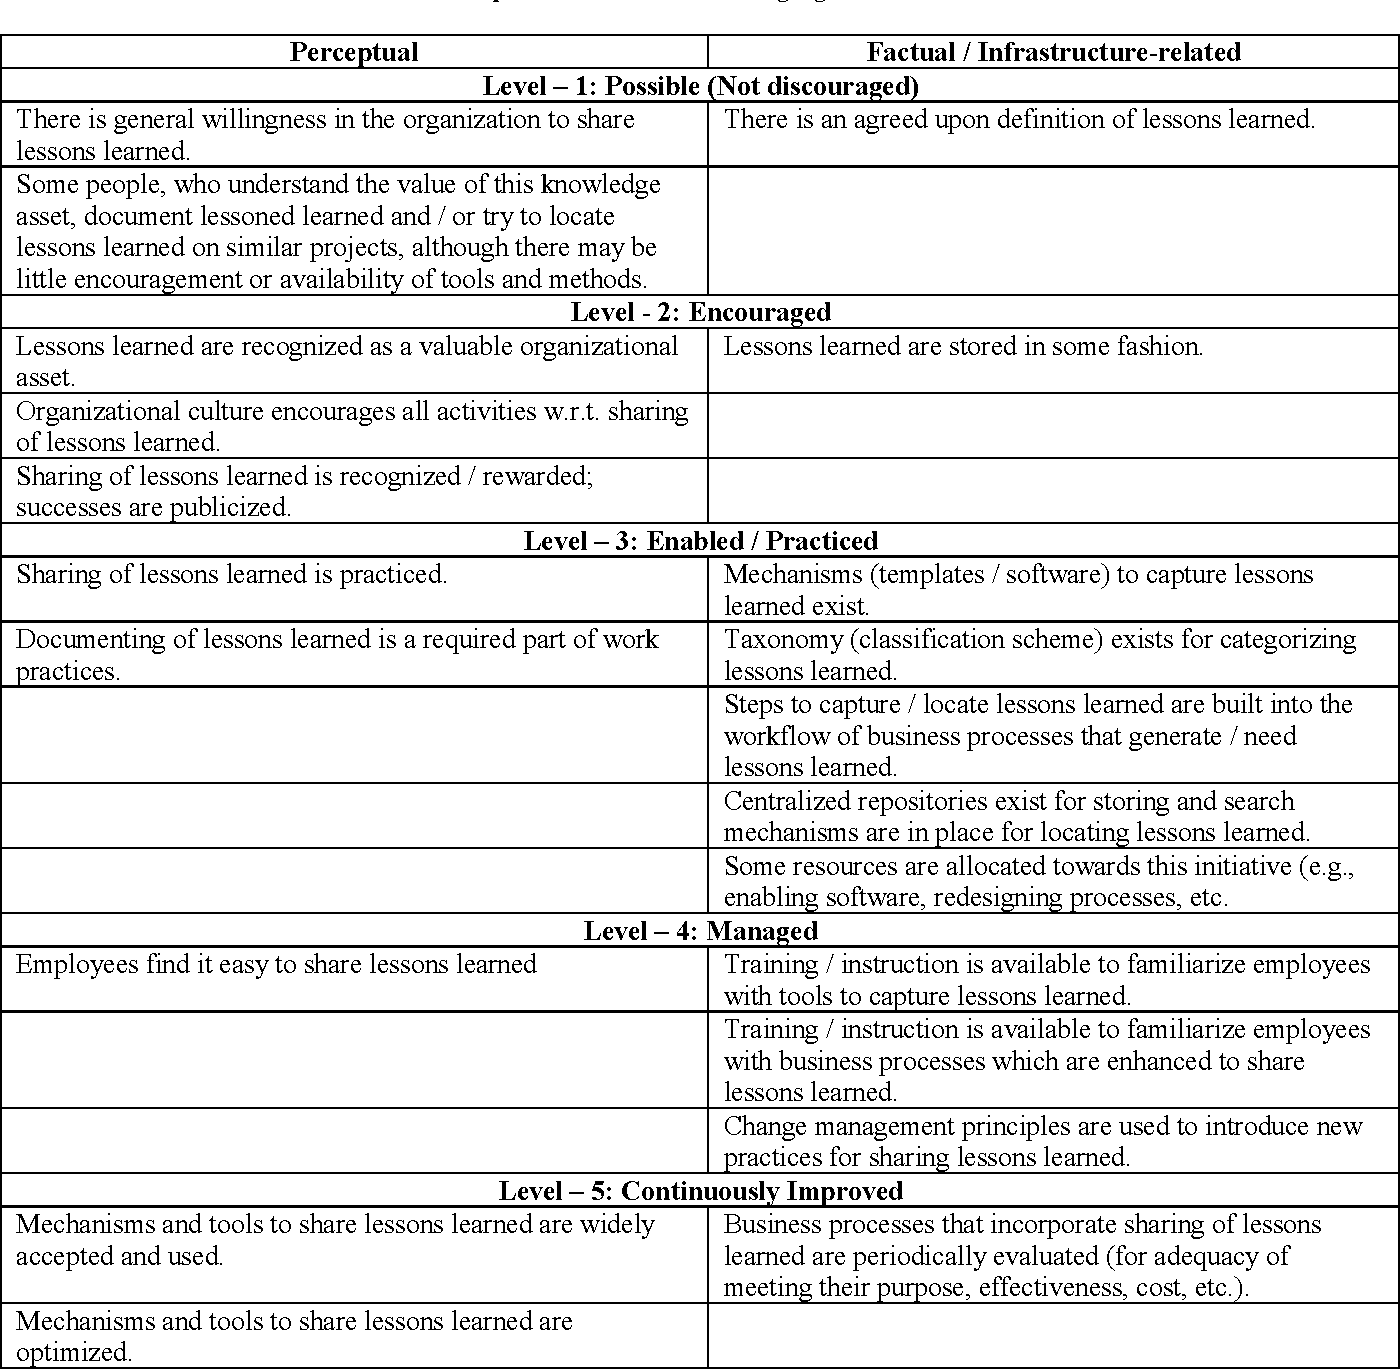 Organizational Self Assessment of Knowledge Management Maturity ...